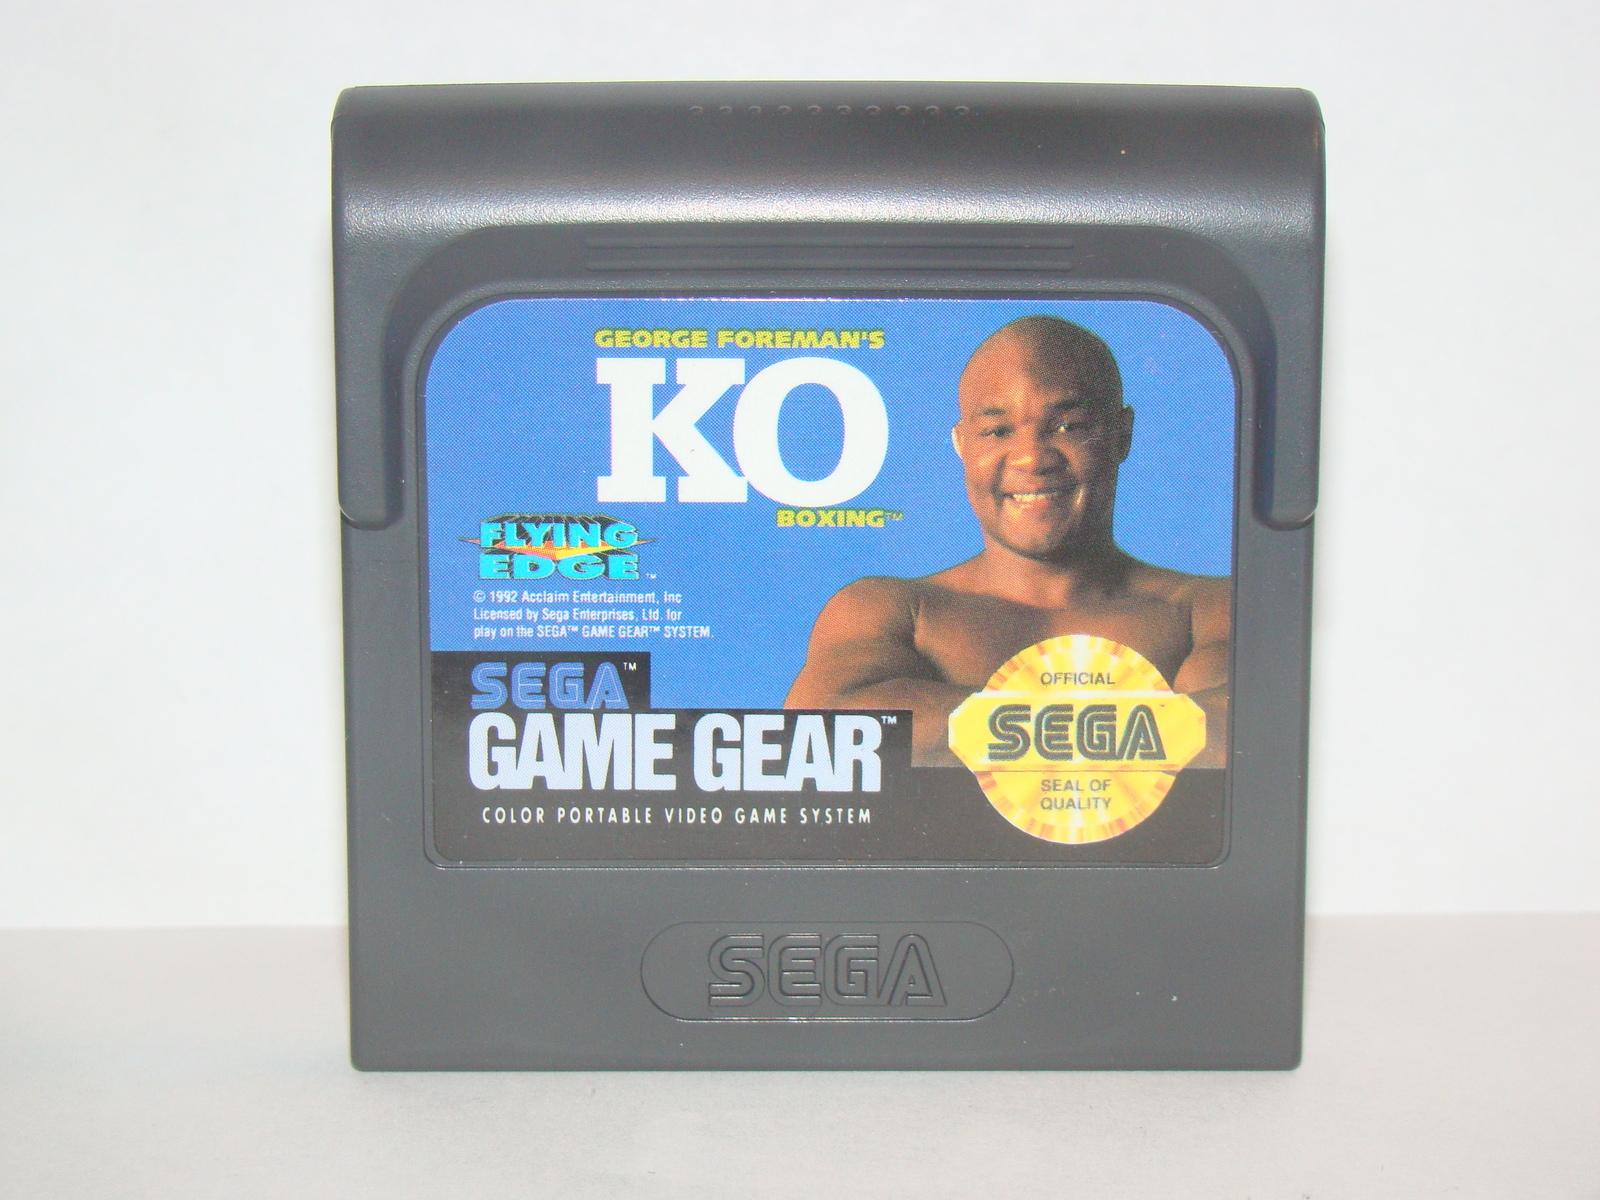 SEGA GAME GEAR - GEORGE FOREMAN'S KO BOXING (Game Only)